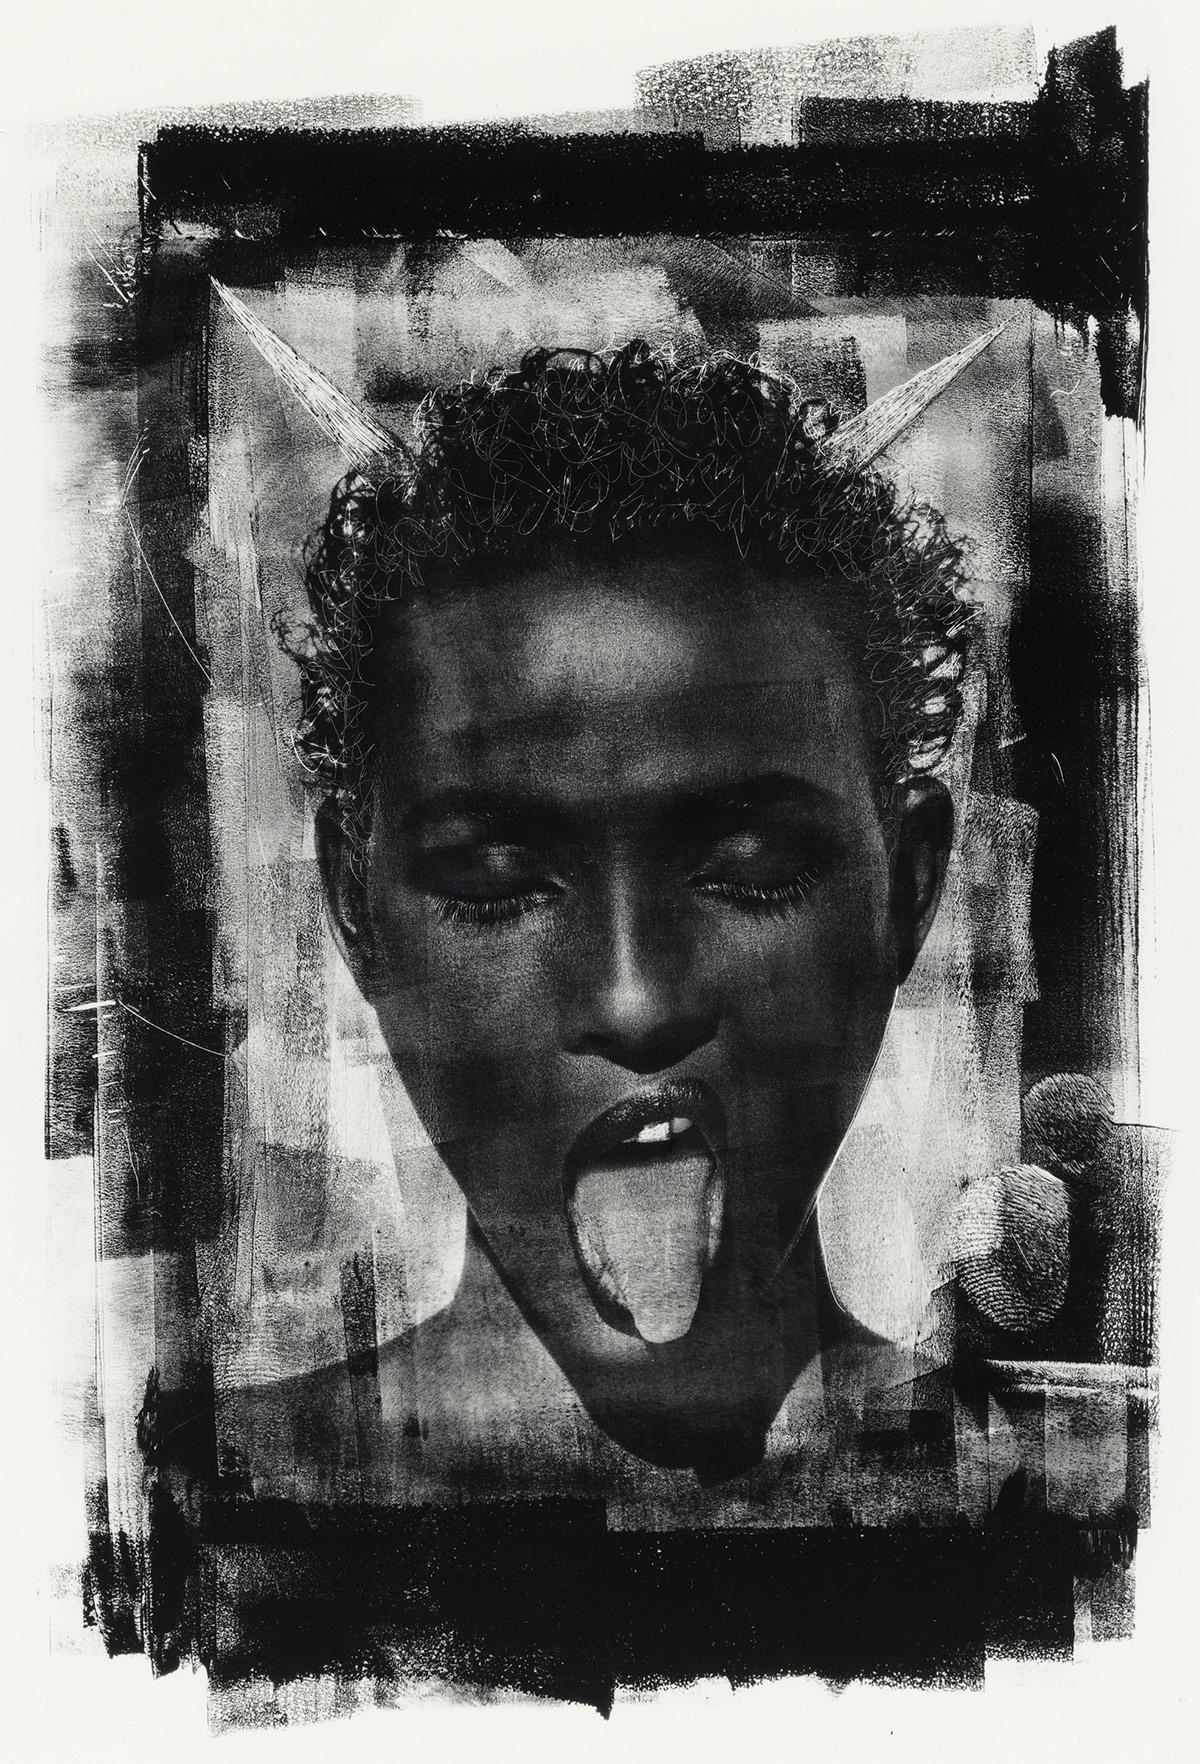 ALBERT-WATSON-(1942--)-Waris-Maroc-[Morocco]